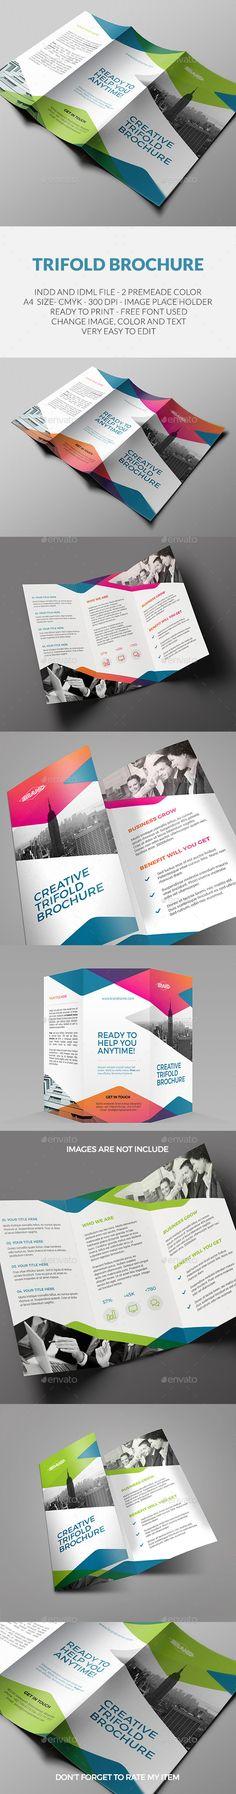 Square Trifold Corporate Brochure-v77 More Corporate brochure - trifold indesign template